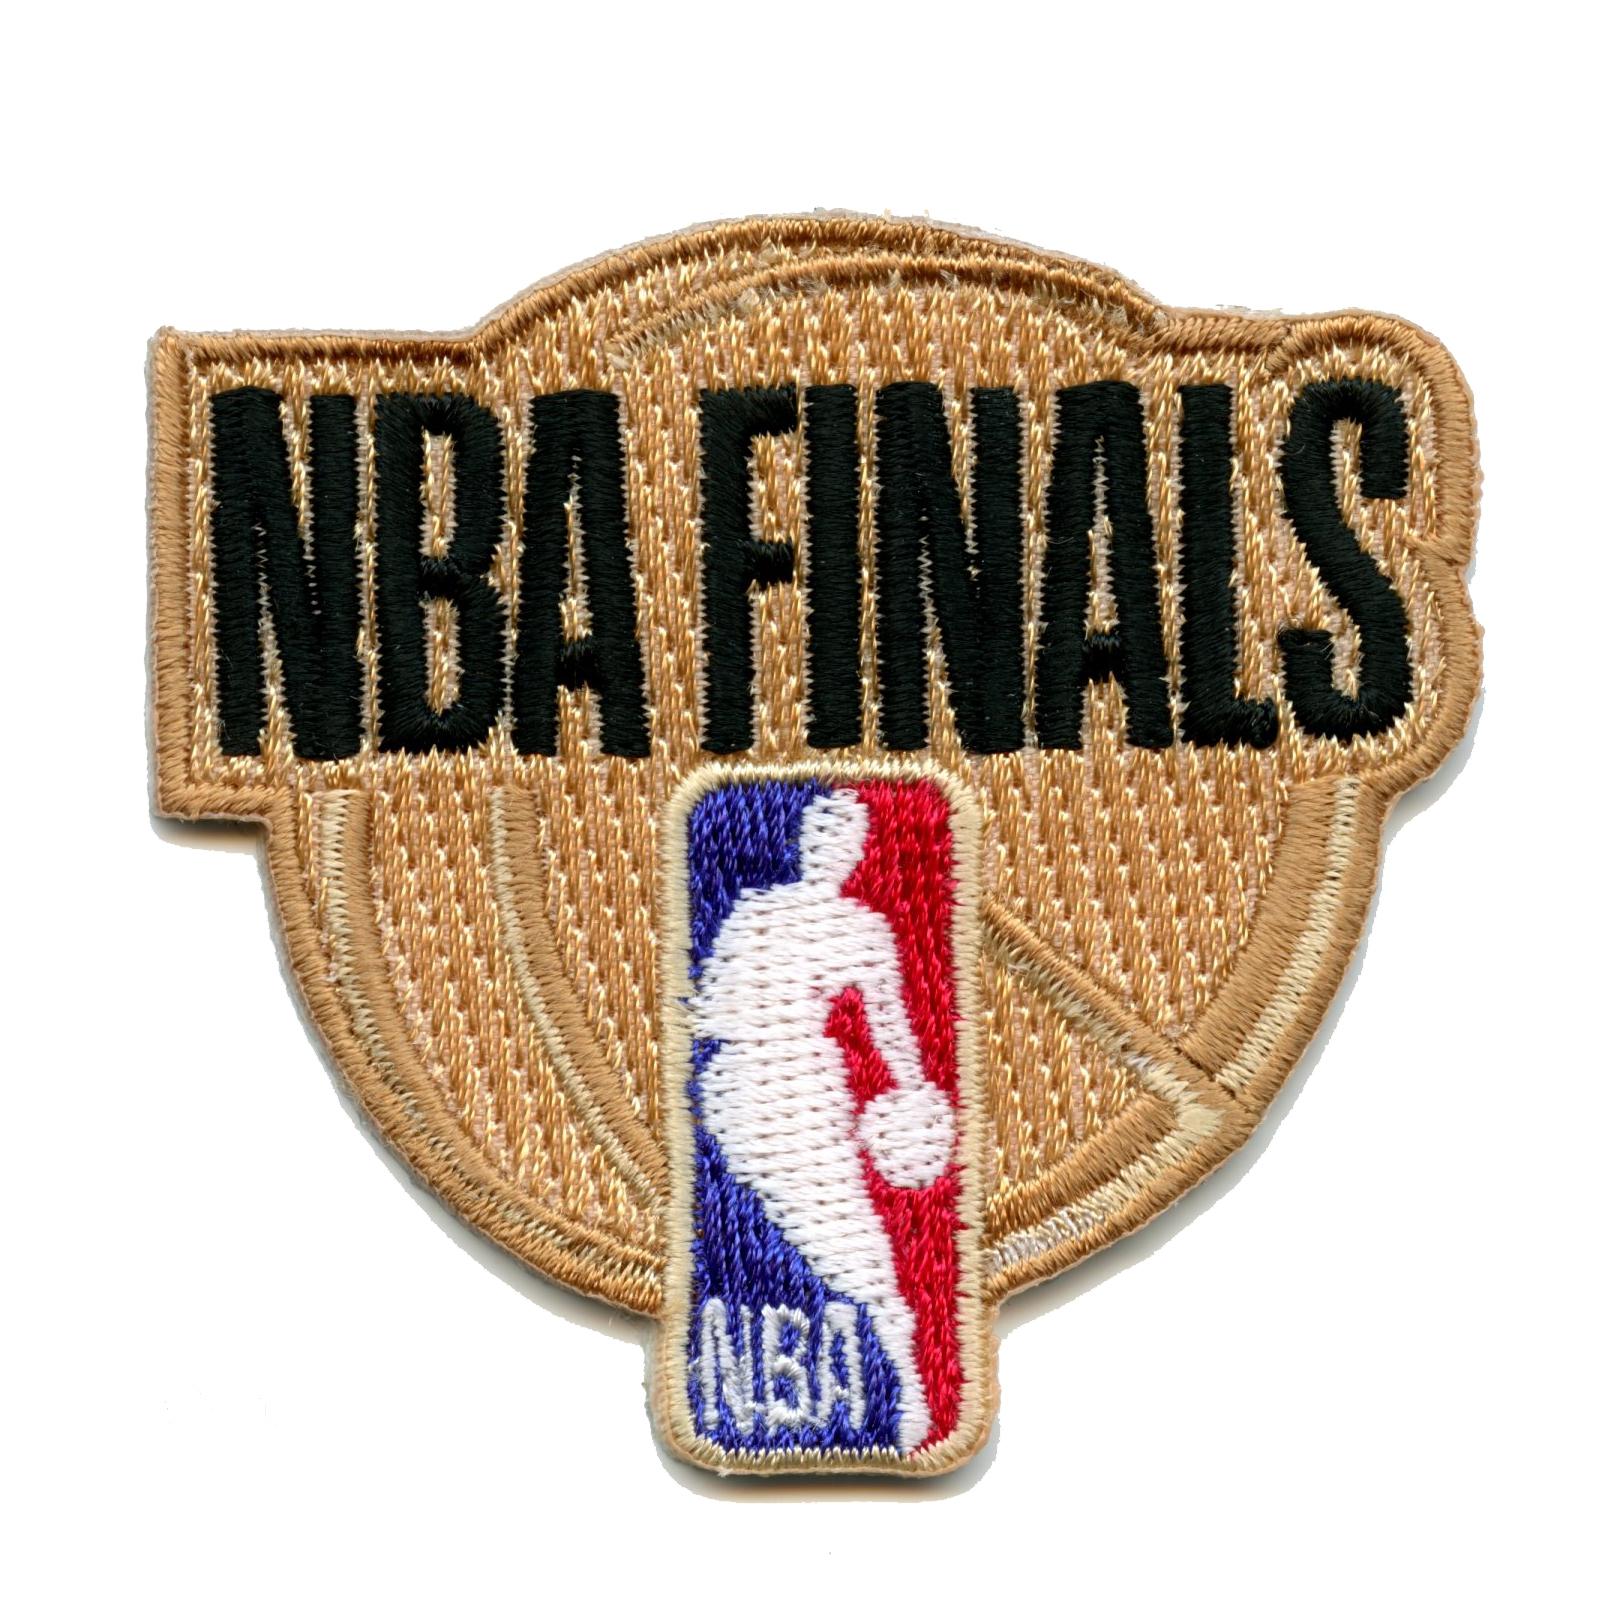 Details about 2019 NBA Finals Championship Jersey Patch Toronto Raptors  Golden State Warriors.